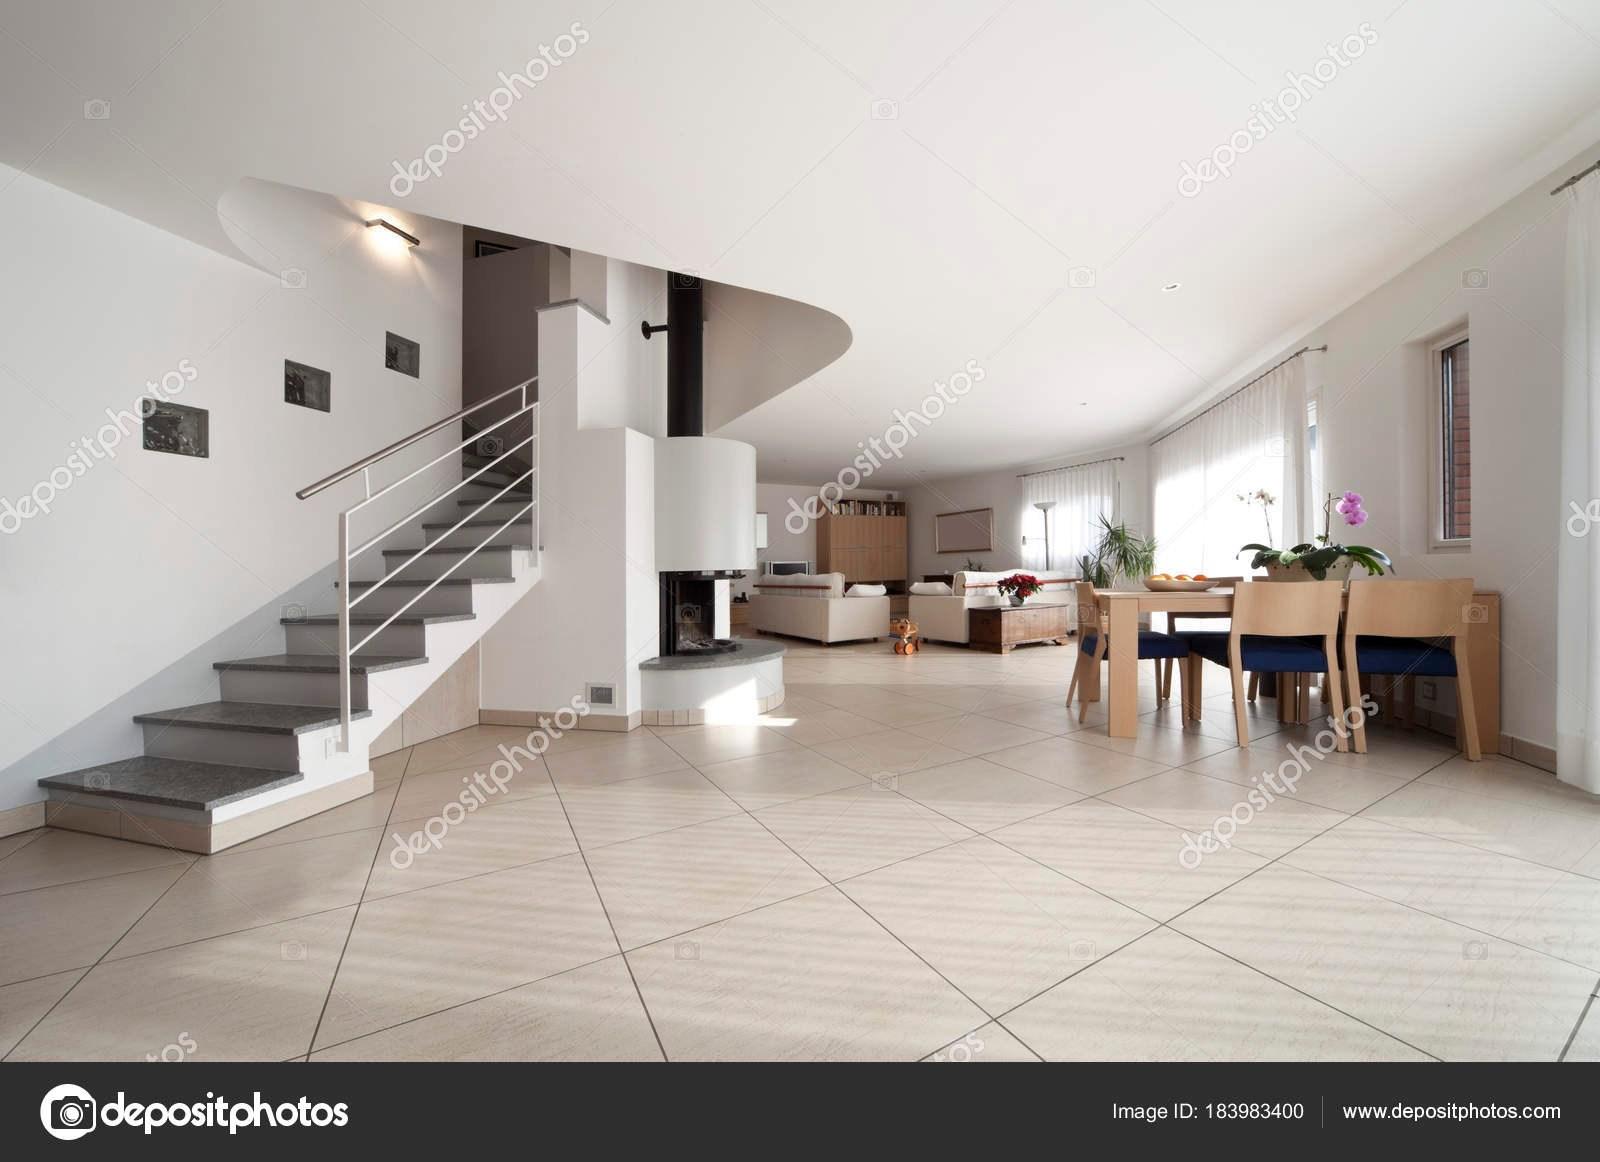 Photos Duplex Interior Wide Livingroom Interior Duplex | Duplex Living Room With Stairs | Modern | Single Room | Duplex Step | Indoor | Balcony